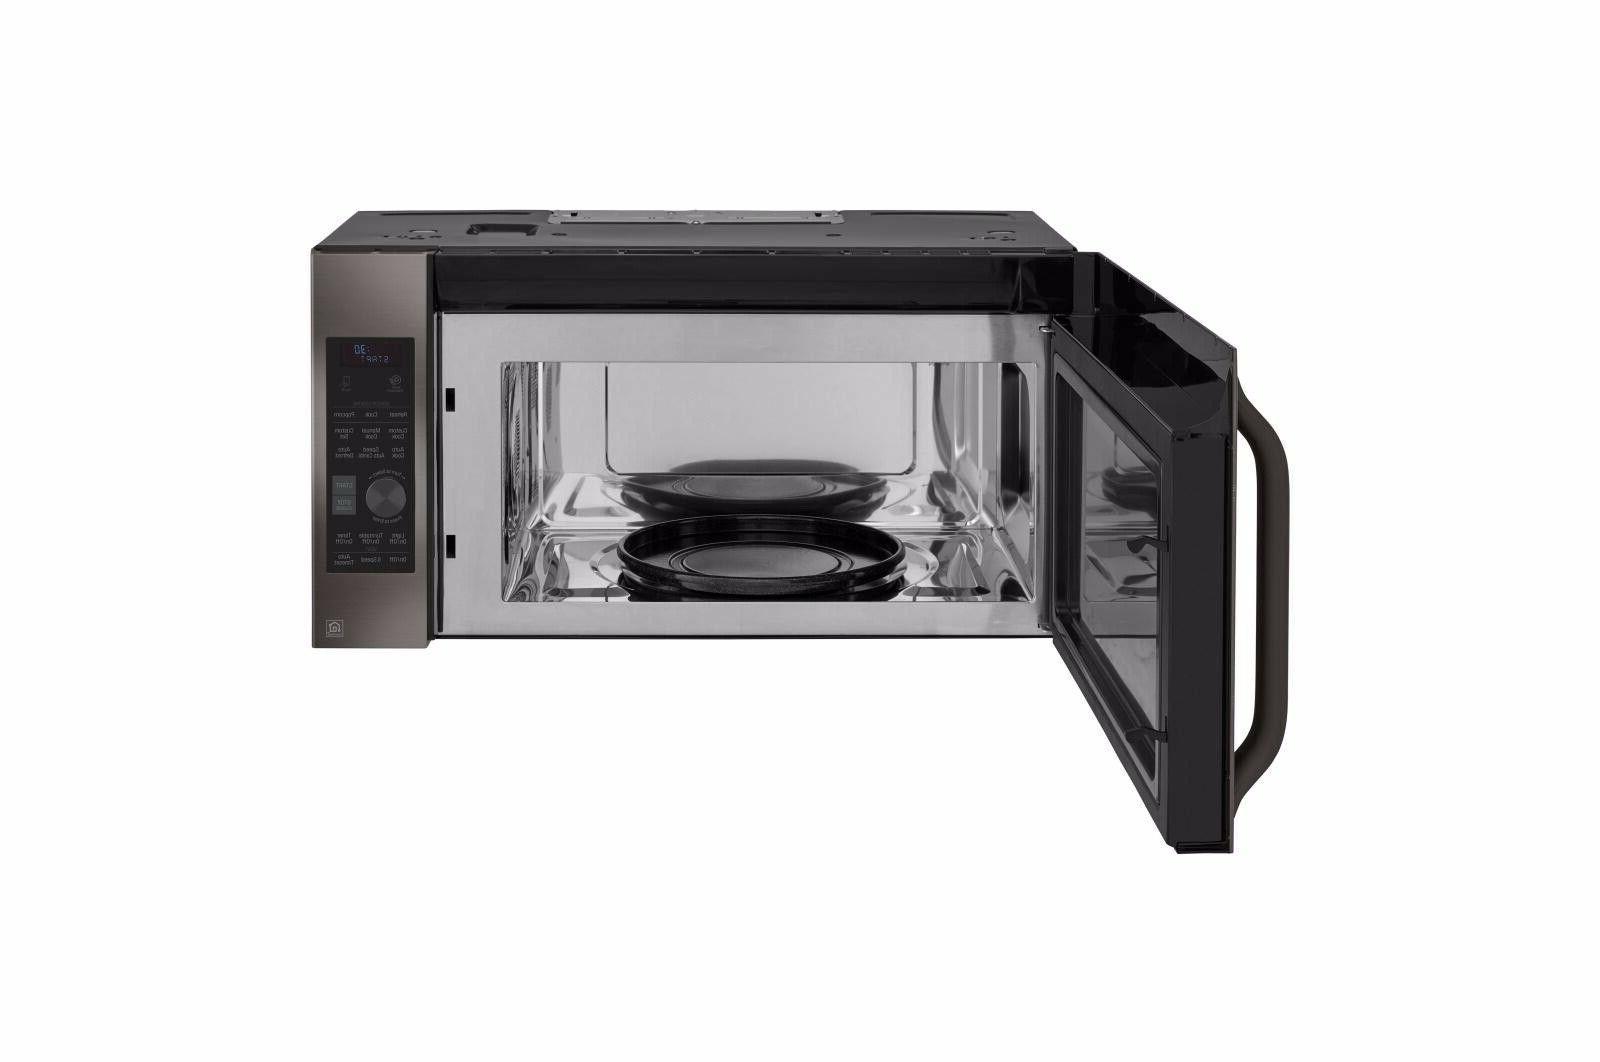 LG ft. Microwave Oven LSMC3089BD